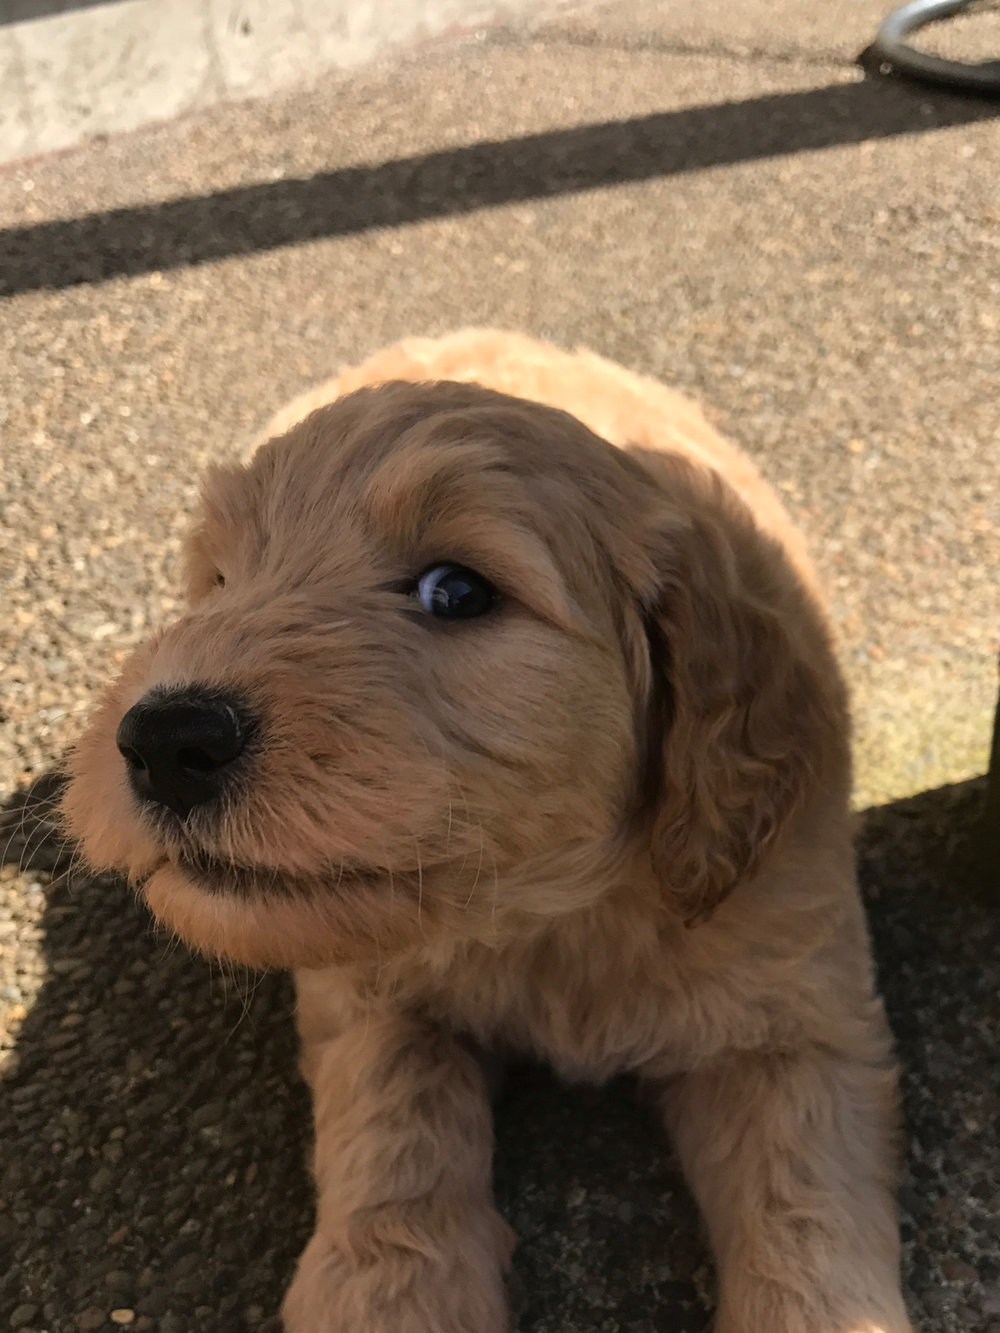 Brand new puppies.